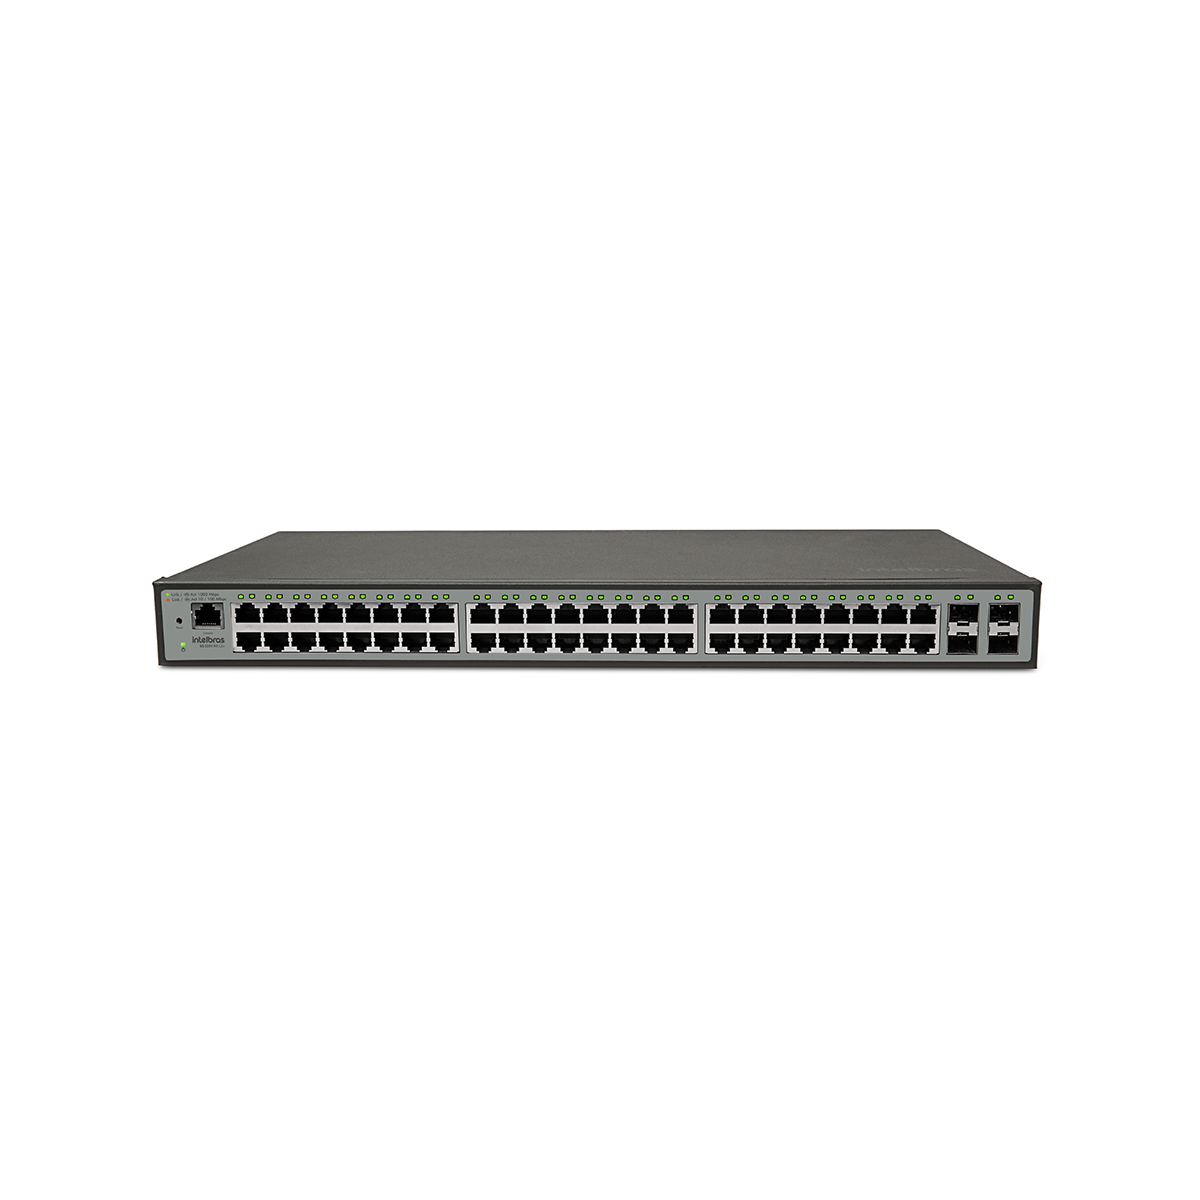 Switch Gerenciável 48P Giga + 4P GBIC - SG 5204 MR L2+